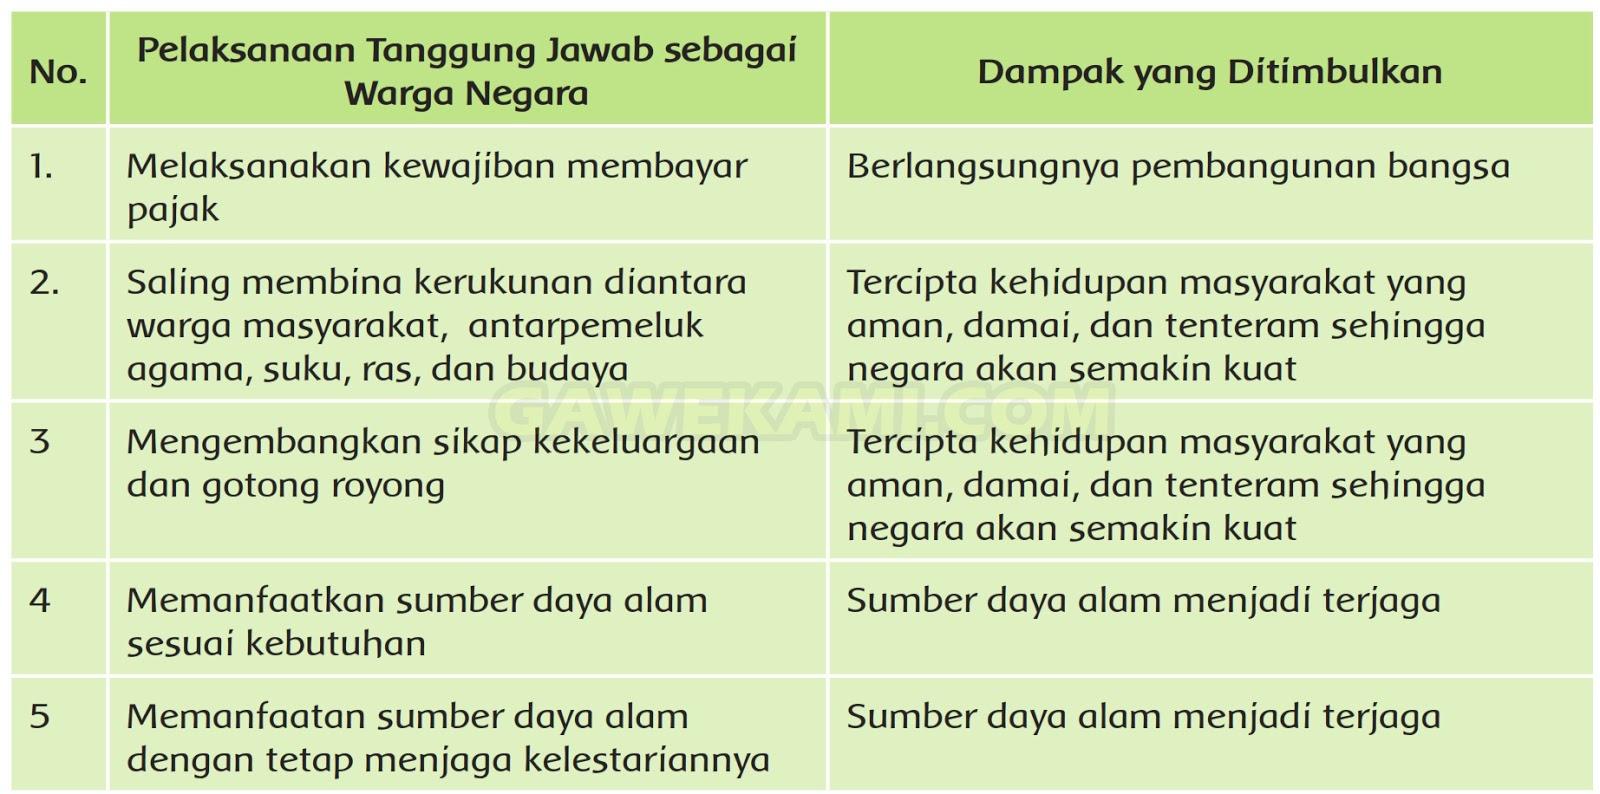 Kunci Jawaban Tematik Kelas 6 Tema 6 Subtema 3 Pembelajaran 3 Halaman 101 102 Gawe Kami